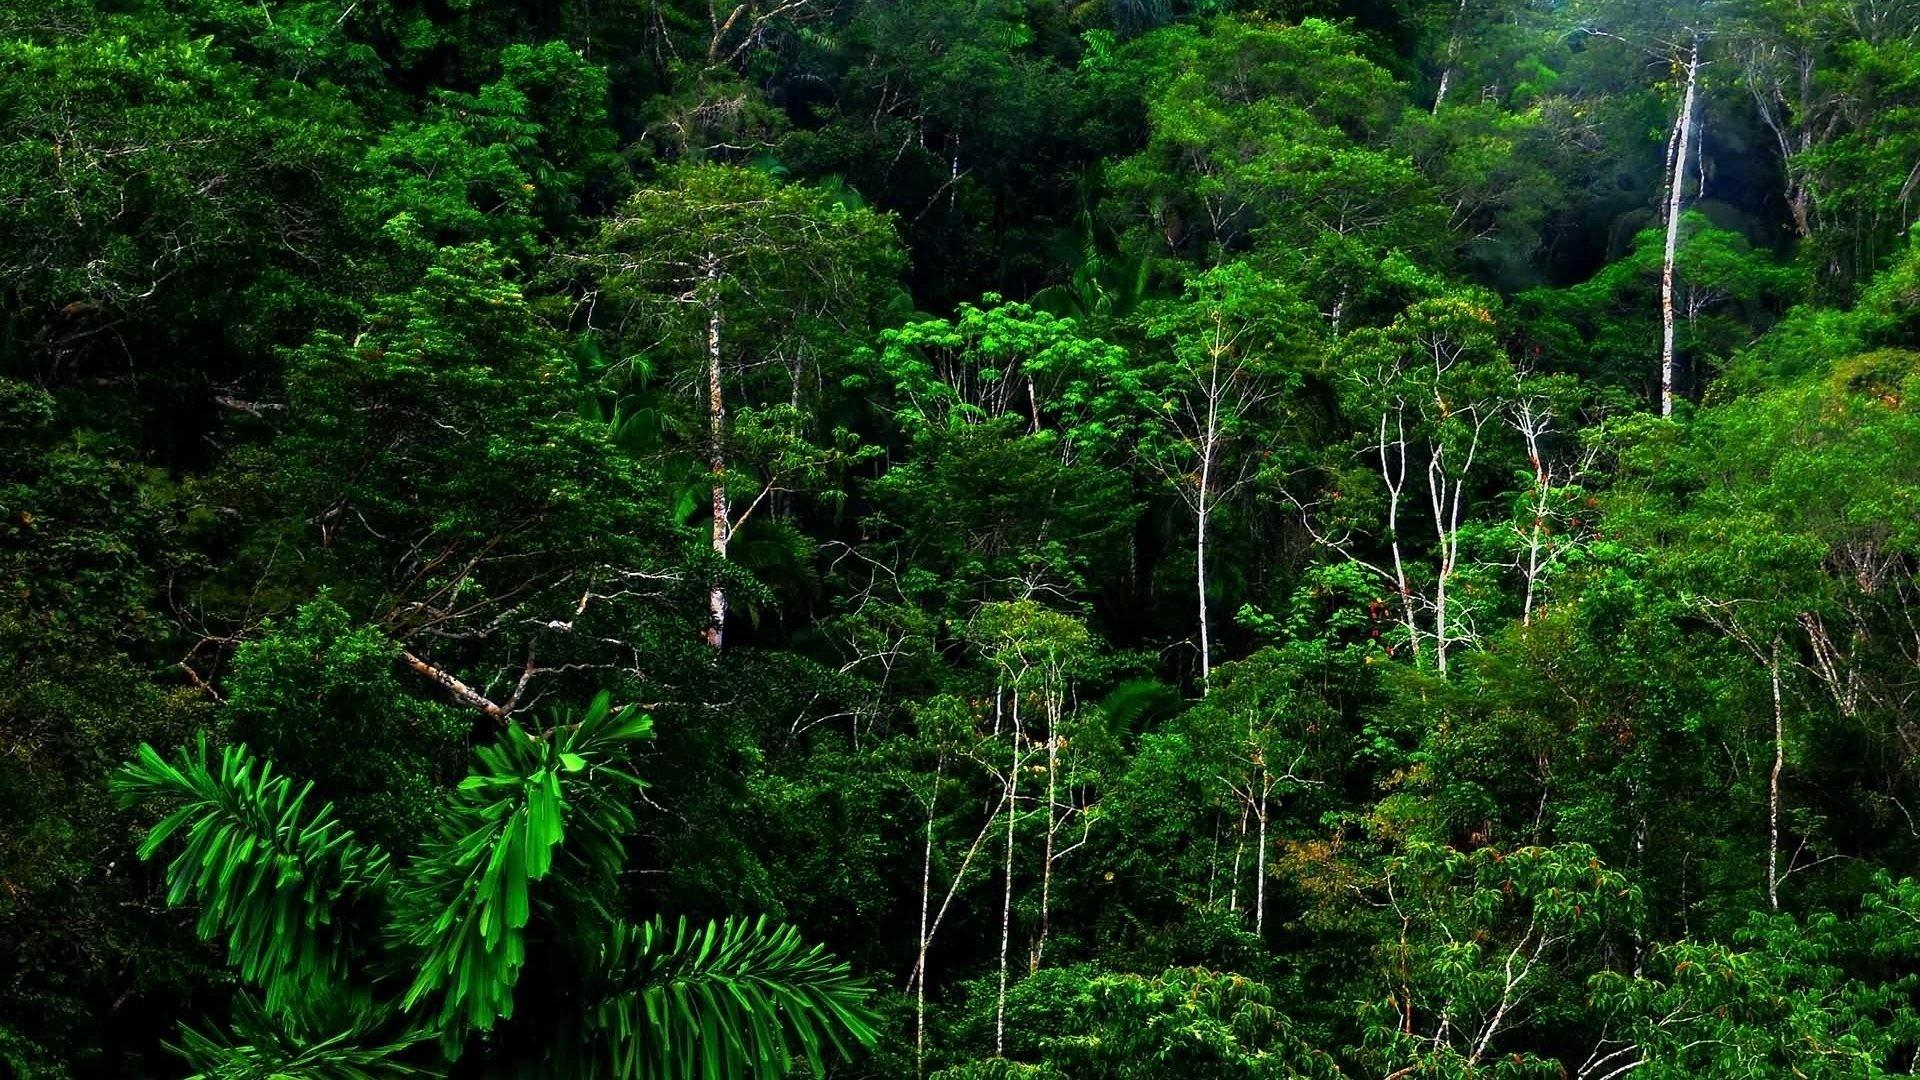 Rainforest Backgrounds 60 Images